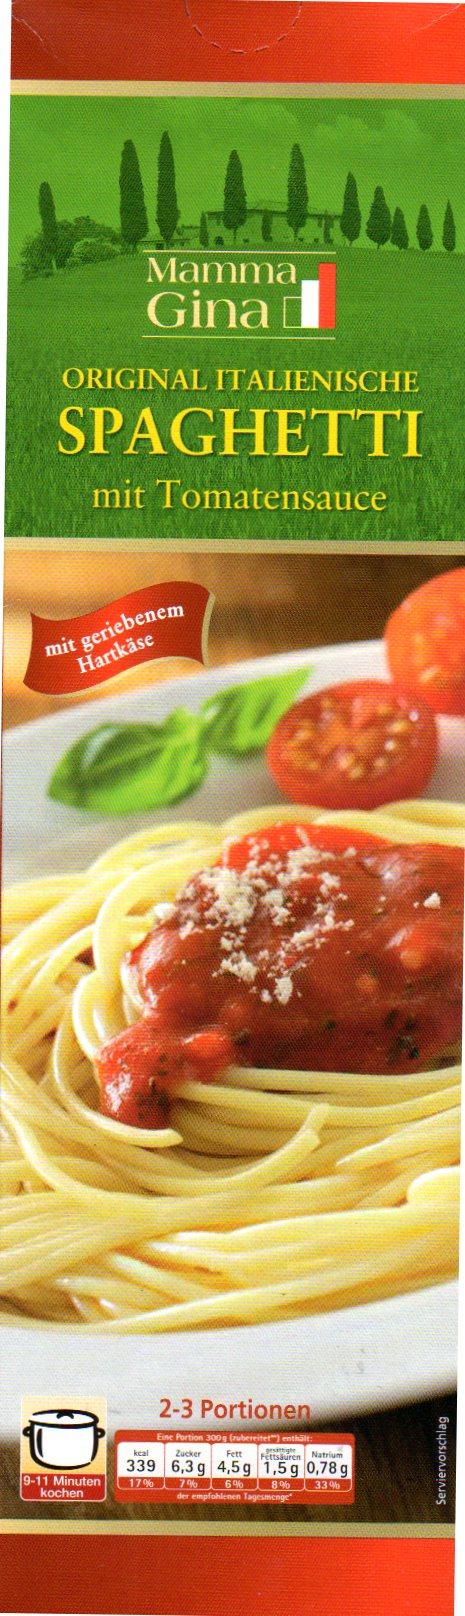 Spaghetti-Gericht Tomate, November 2012